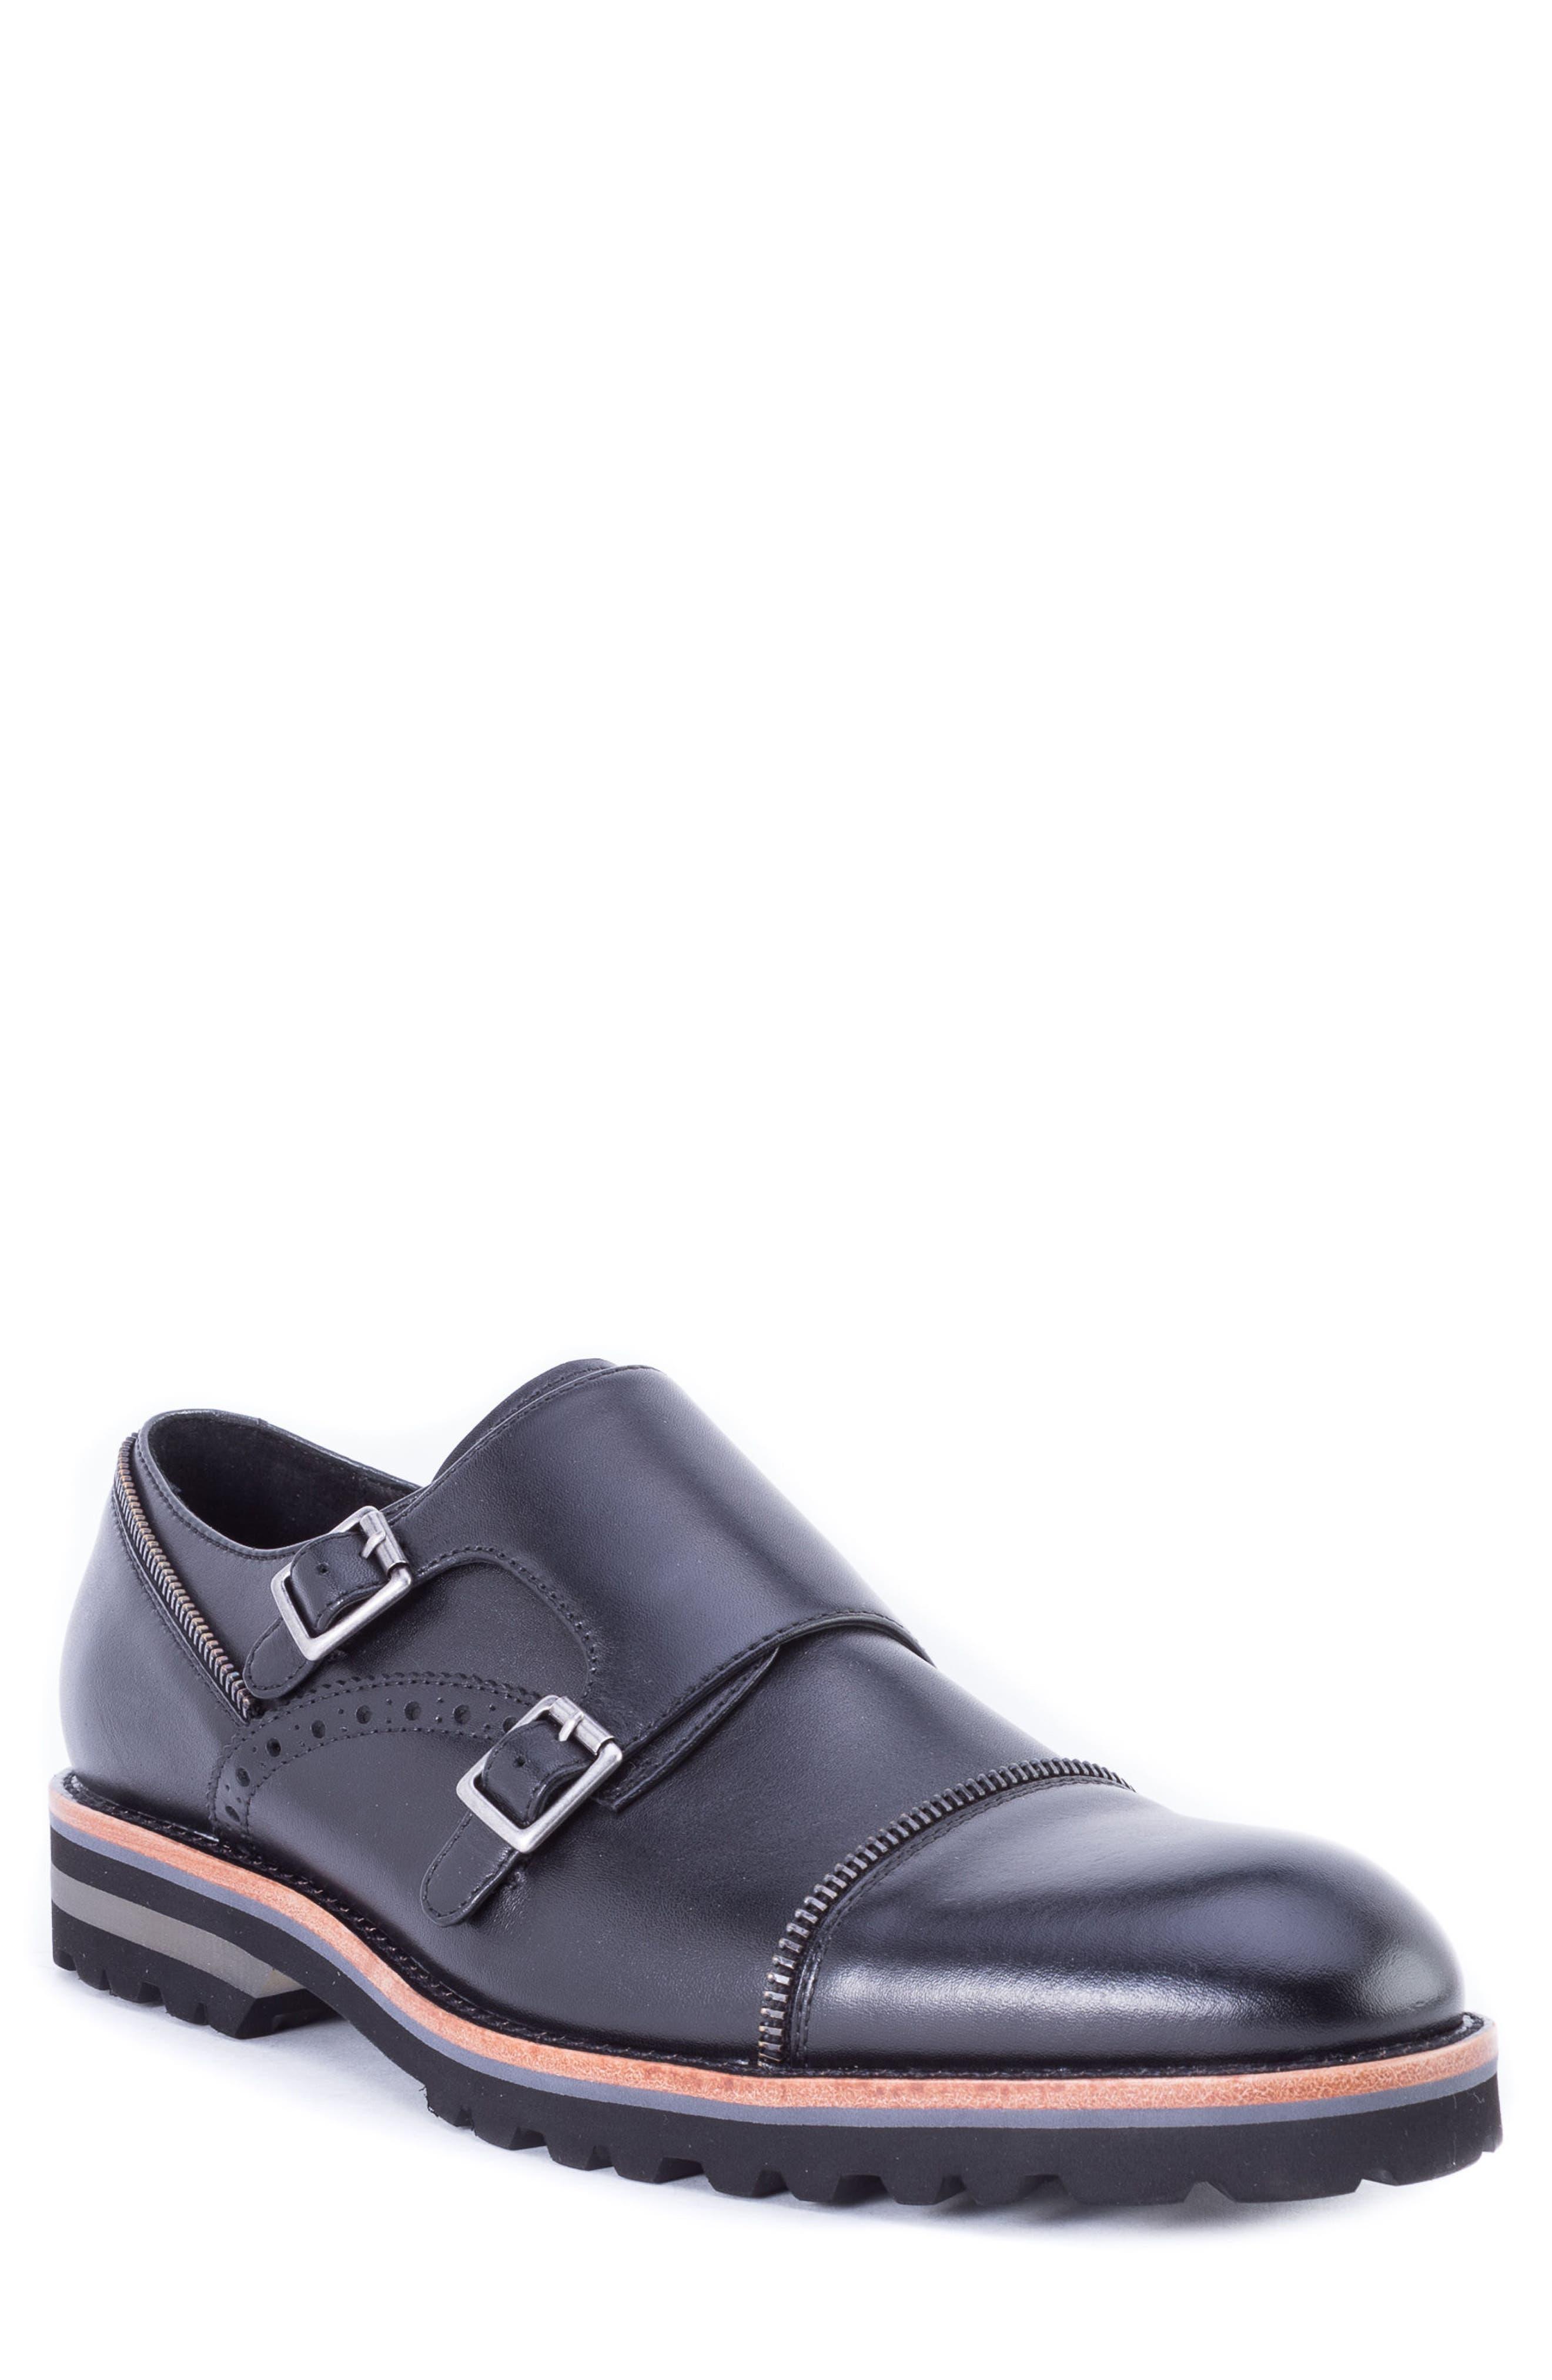 Acadia Double Buckle Monk Shoe,                         Main,                         color, BLACK LEATHER